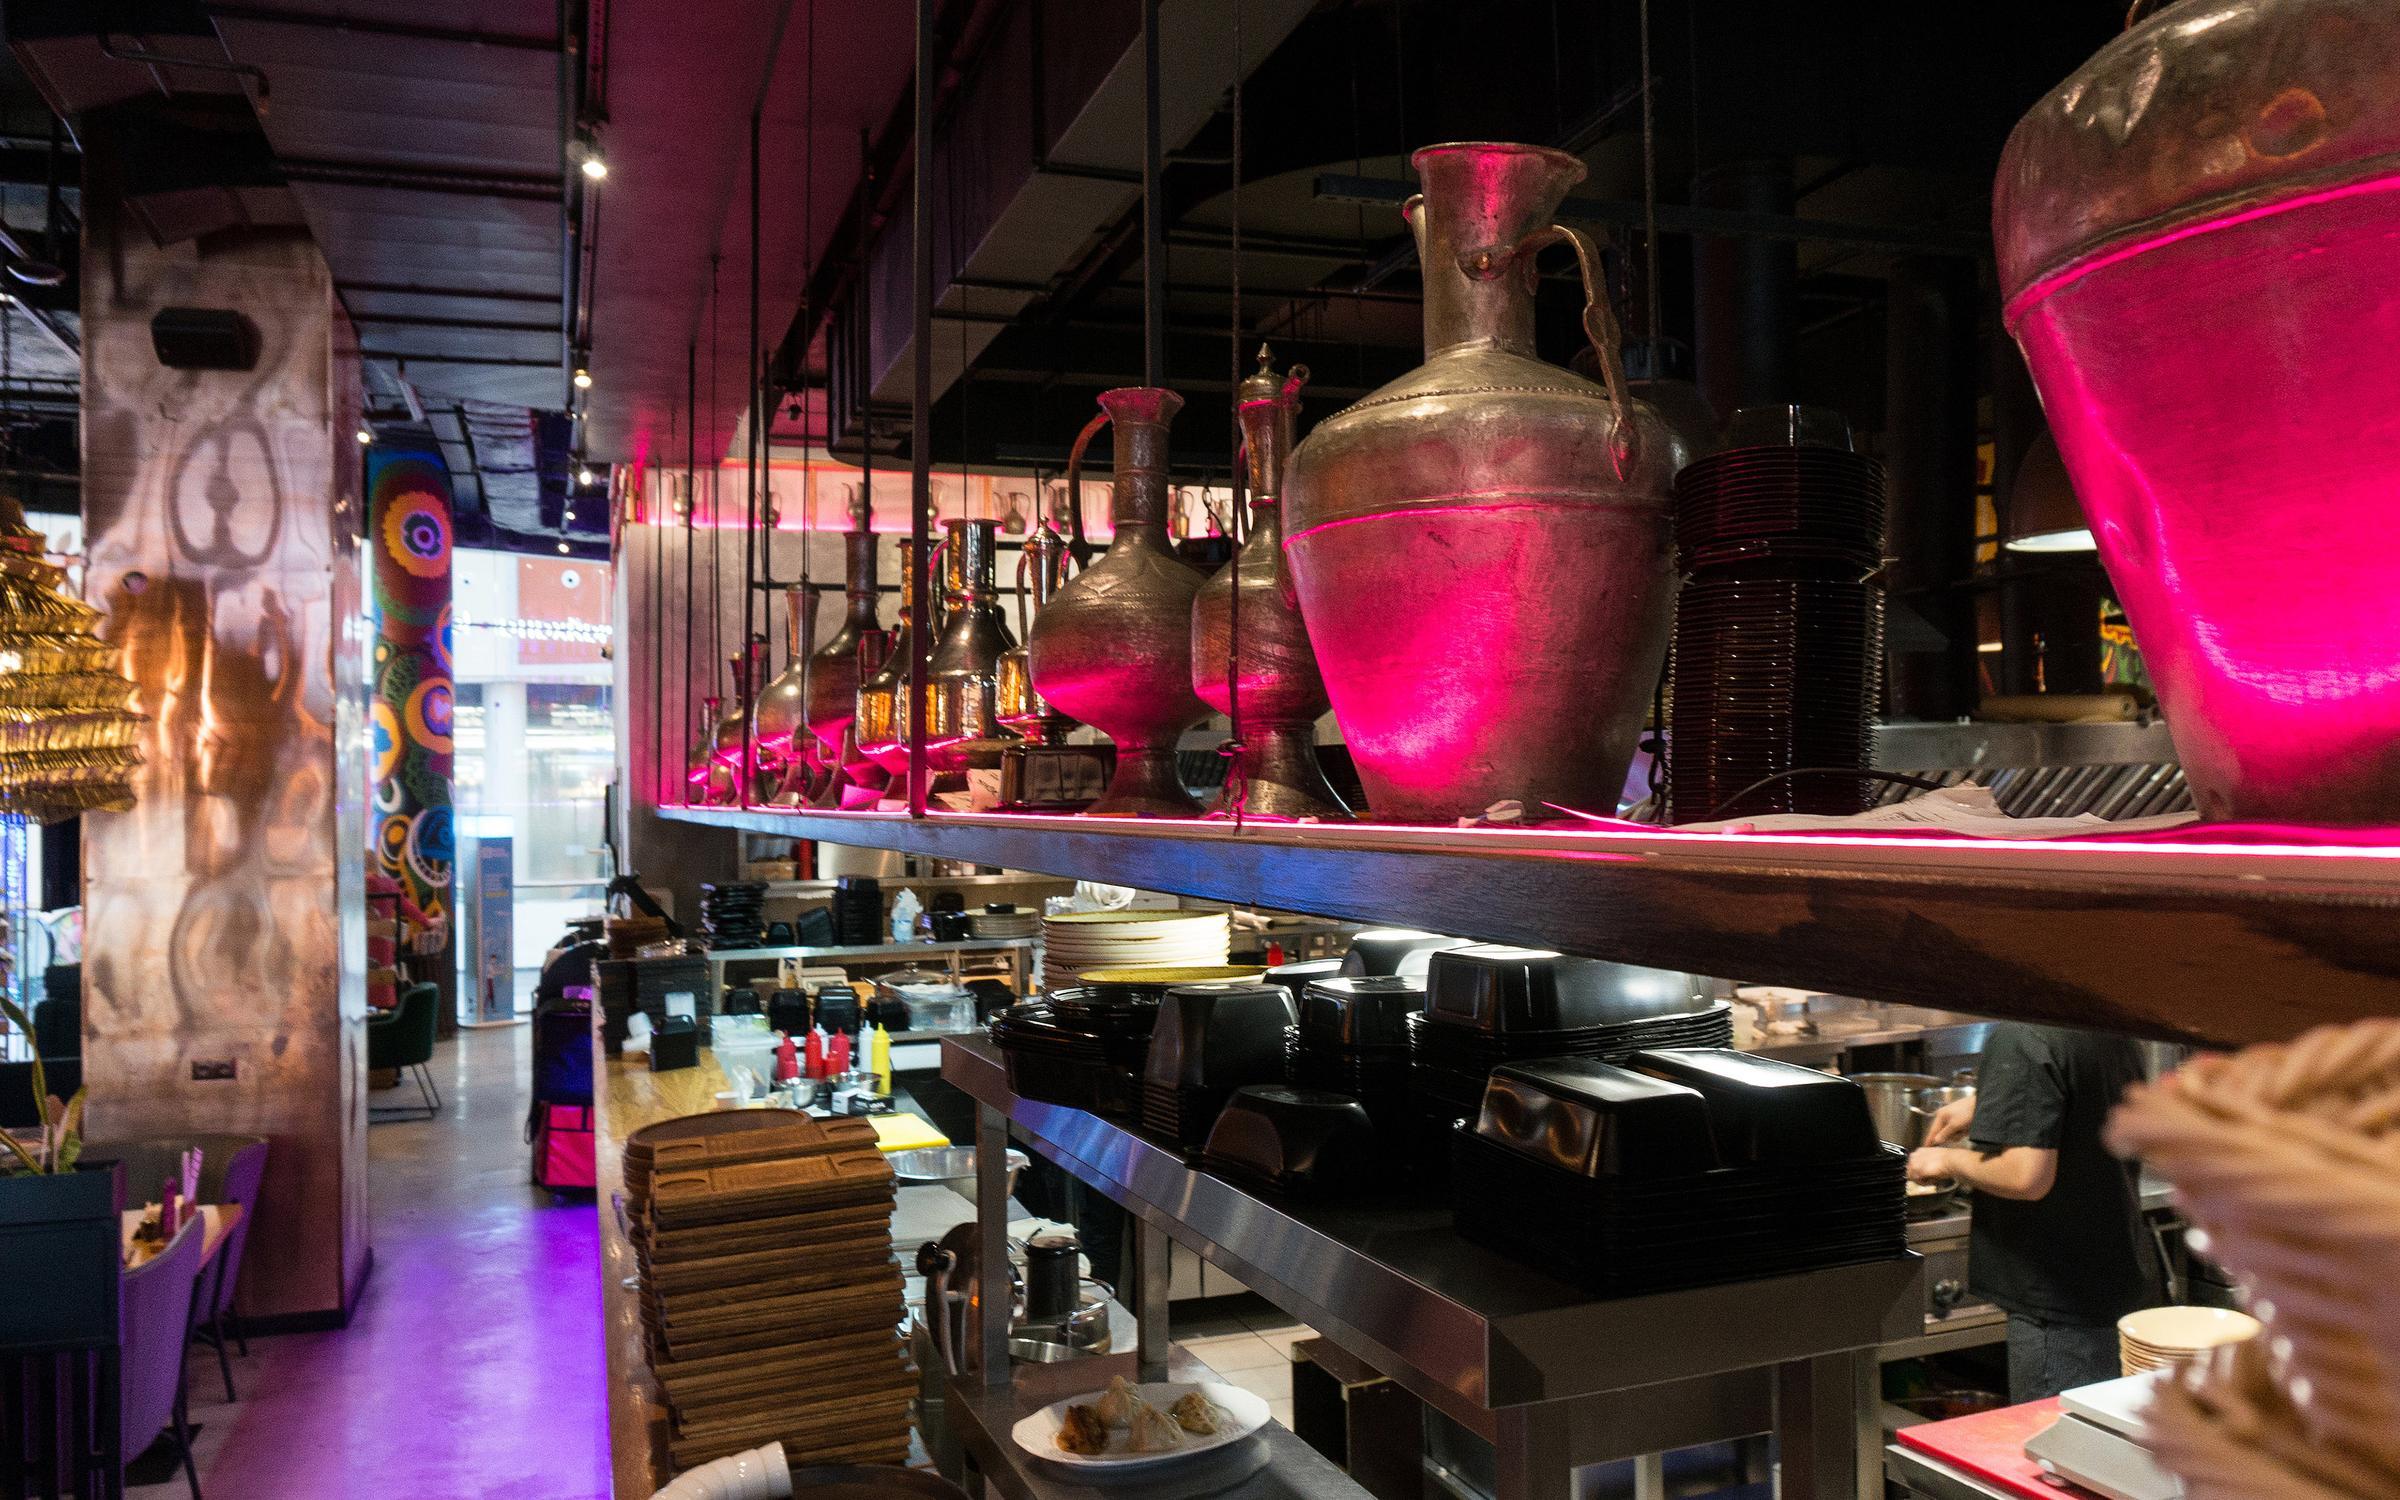 фотография Ресторана Урюк в ТЦ Метрополис